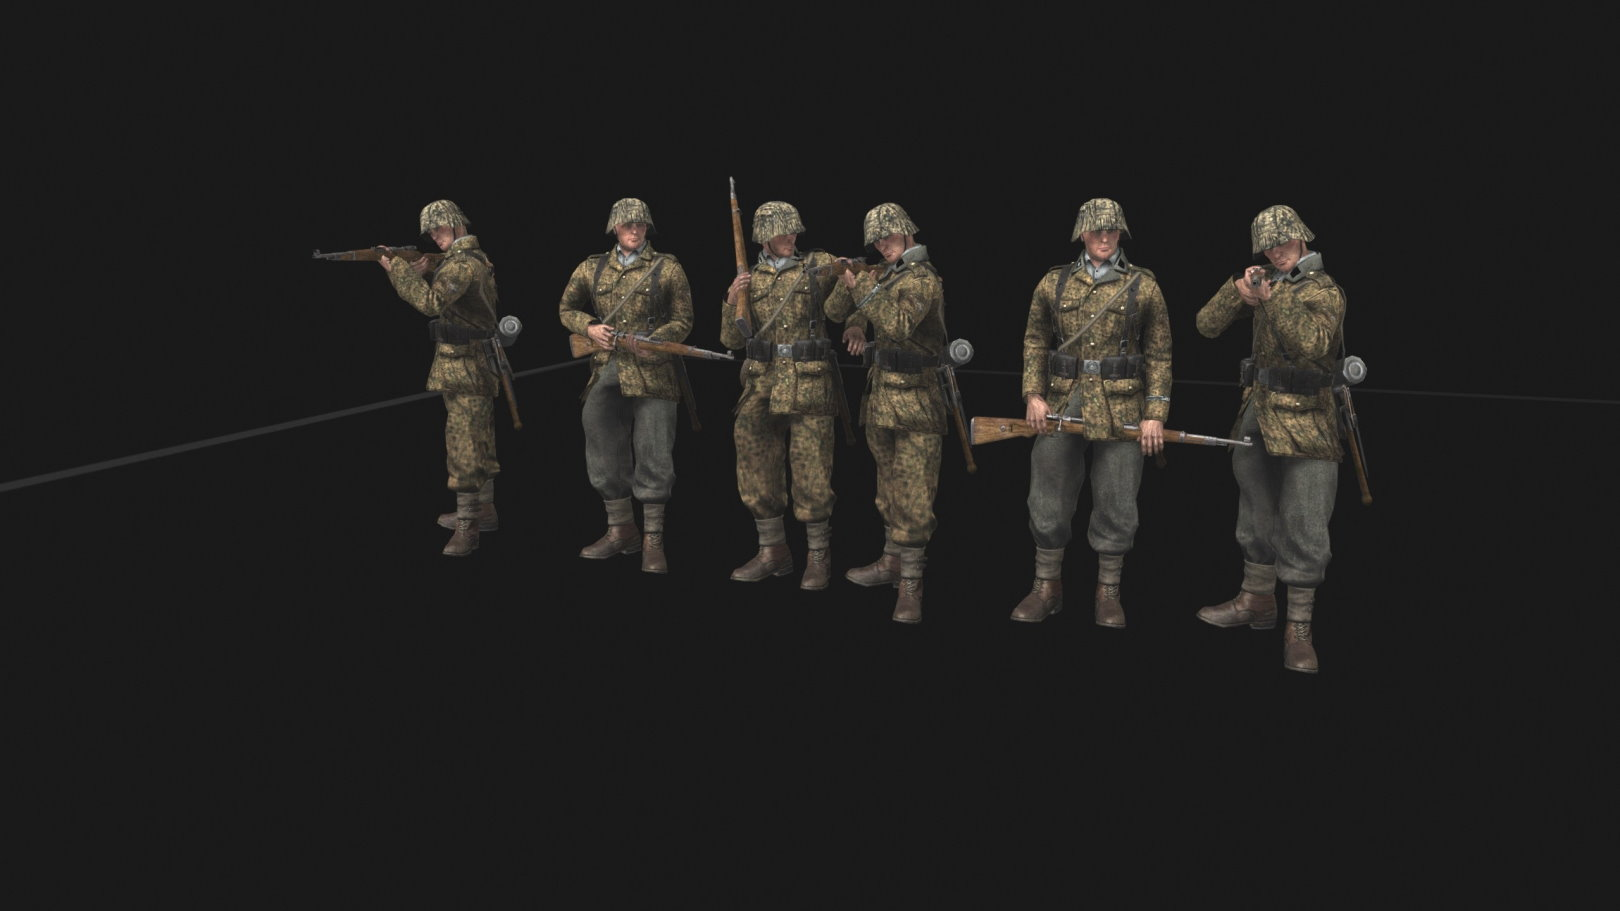 Waffen SS Faction (CtA: GoH — 1.003.0, 1.004.0) (v26.06.2021)